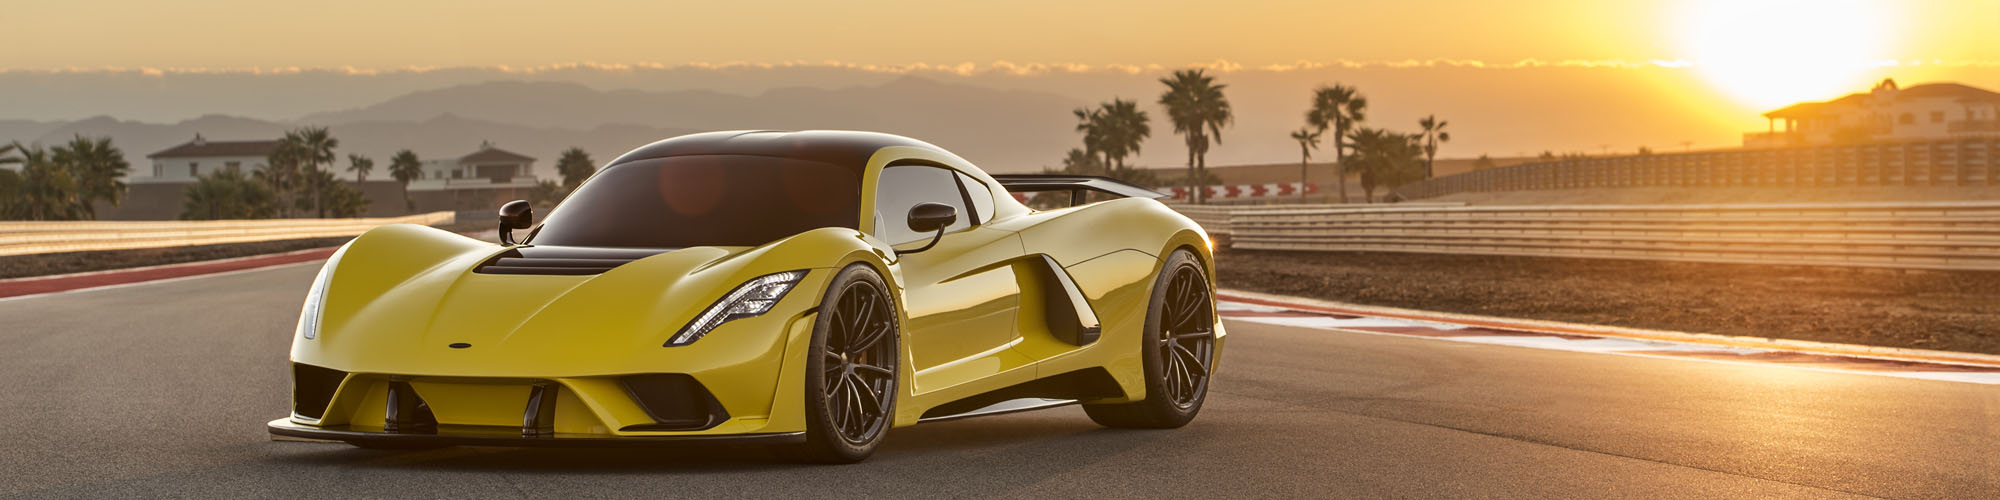 America's Hypercar: Hennessey Venom F5